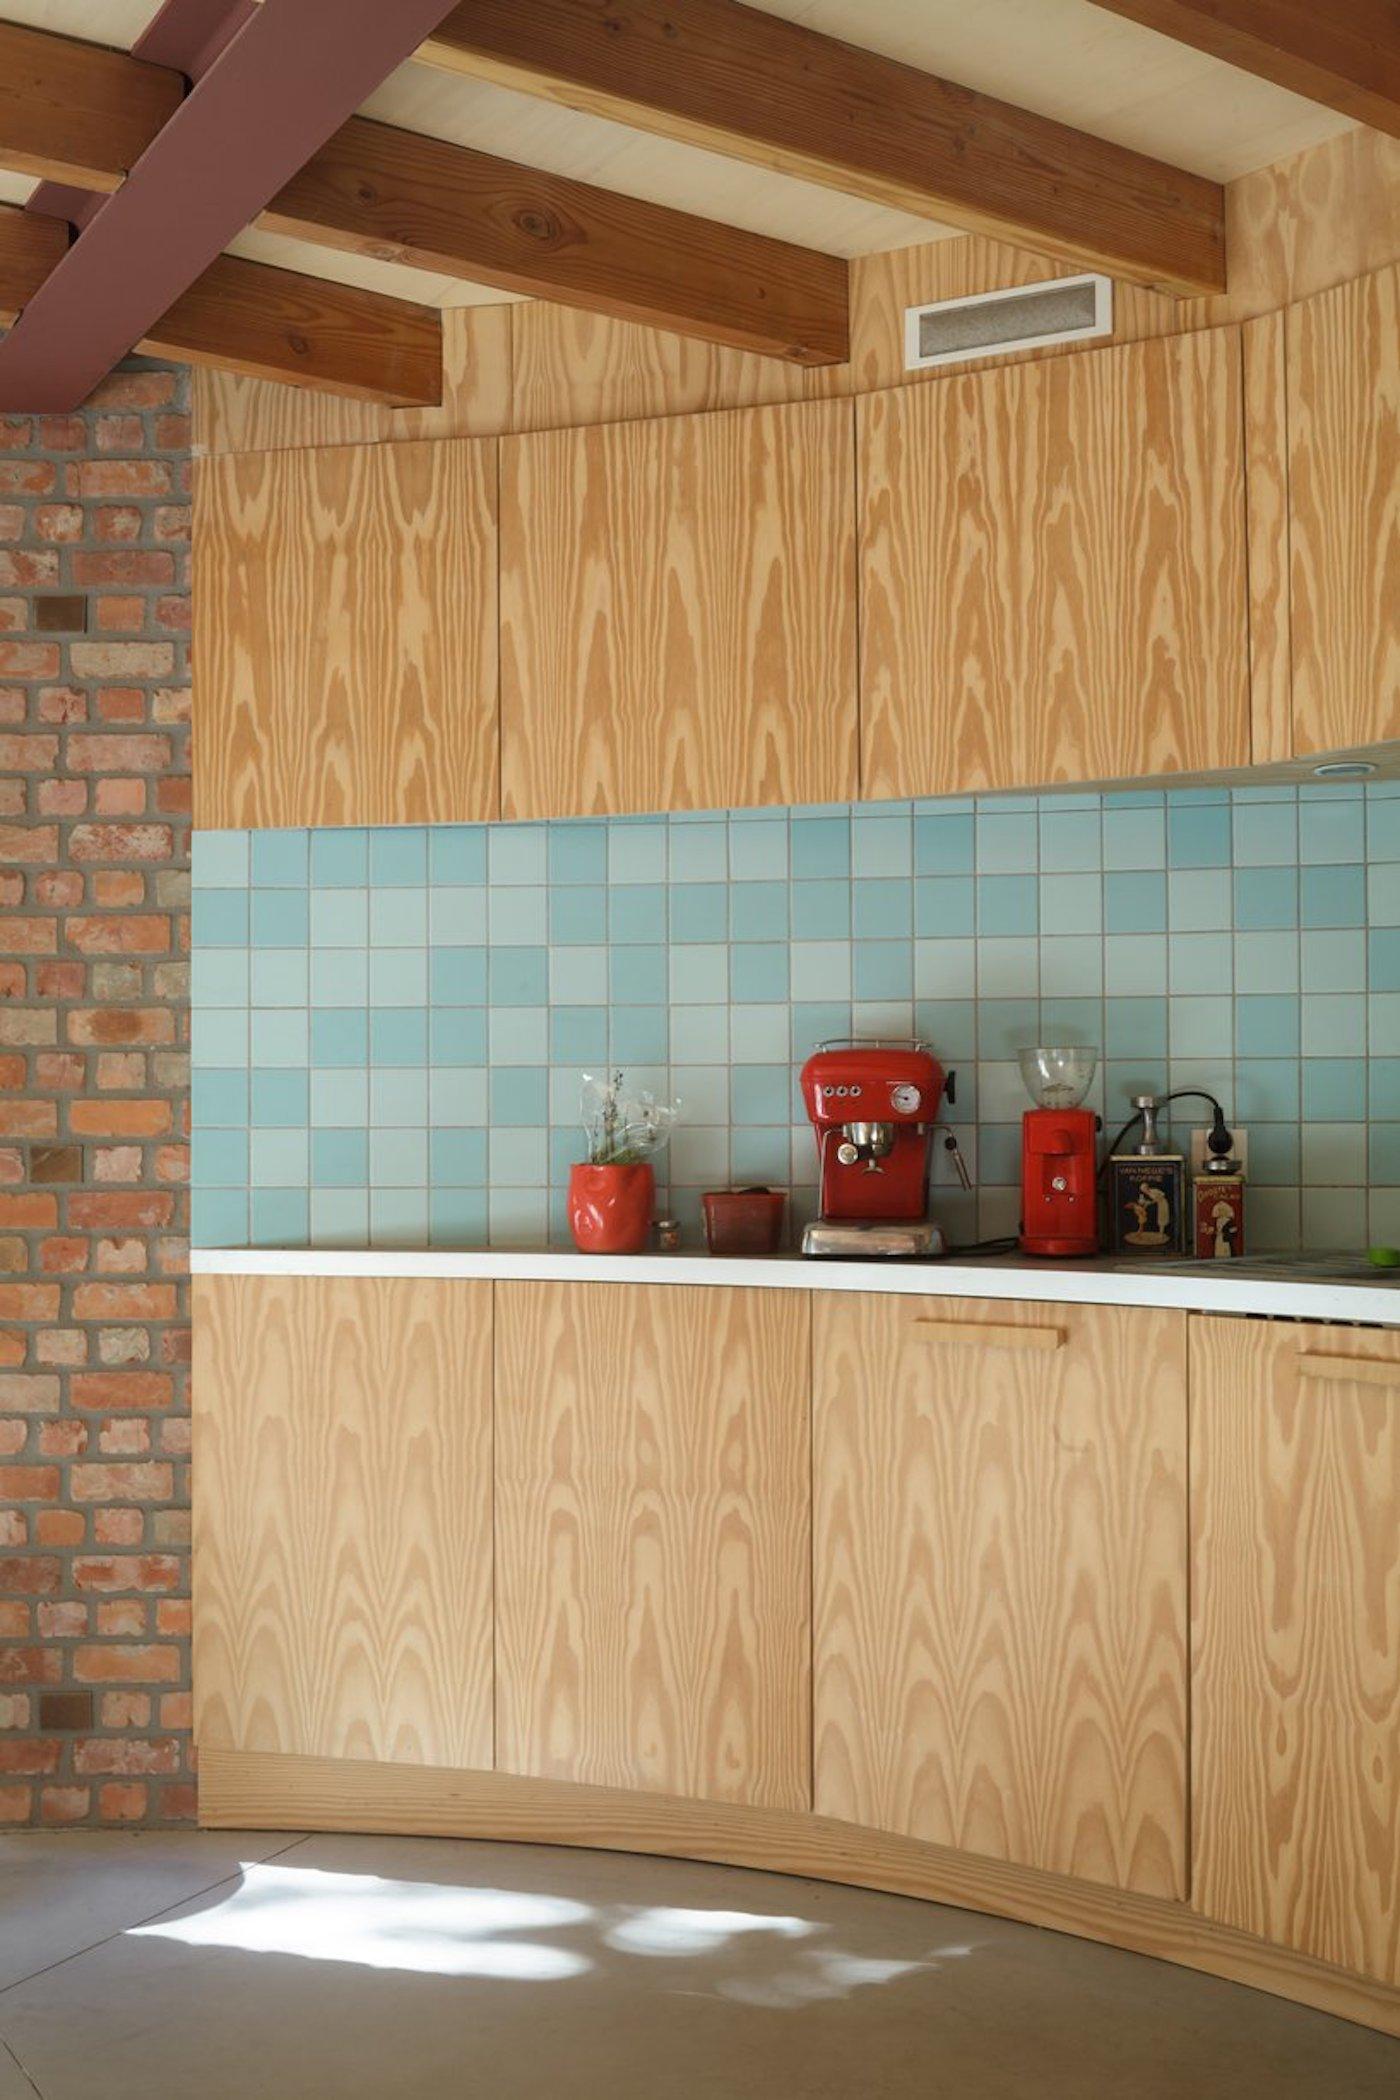 Curved timber kitchen with tile splash back